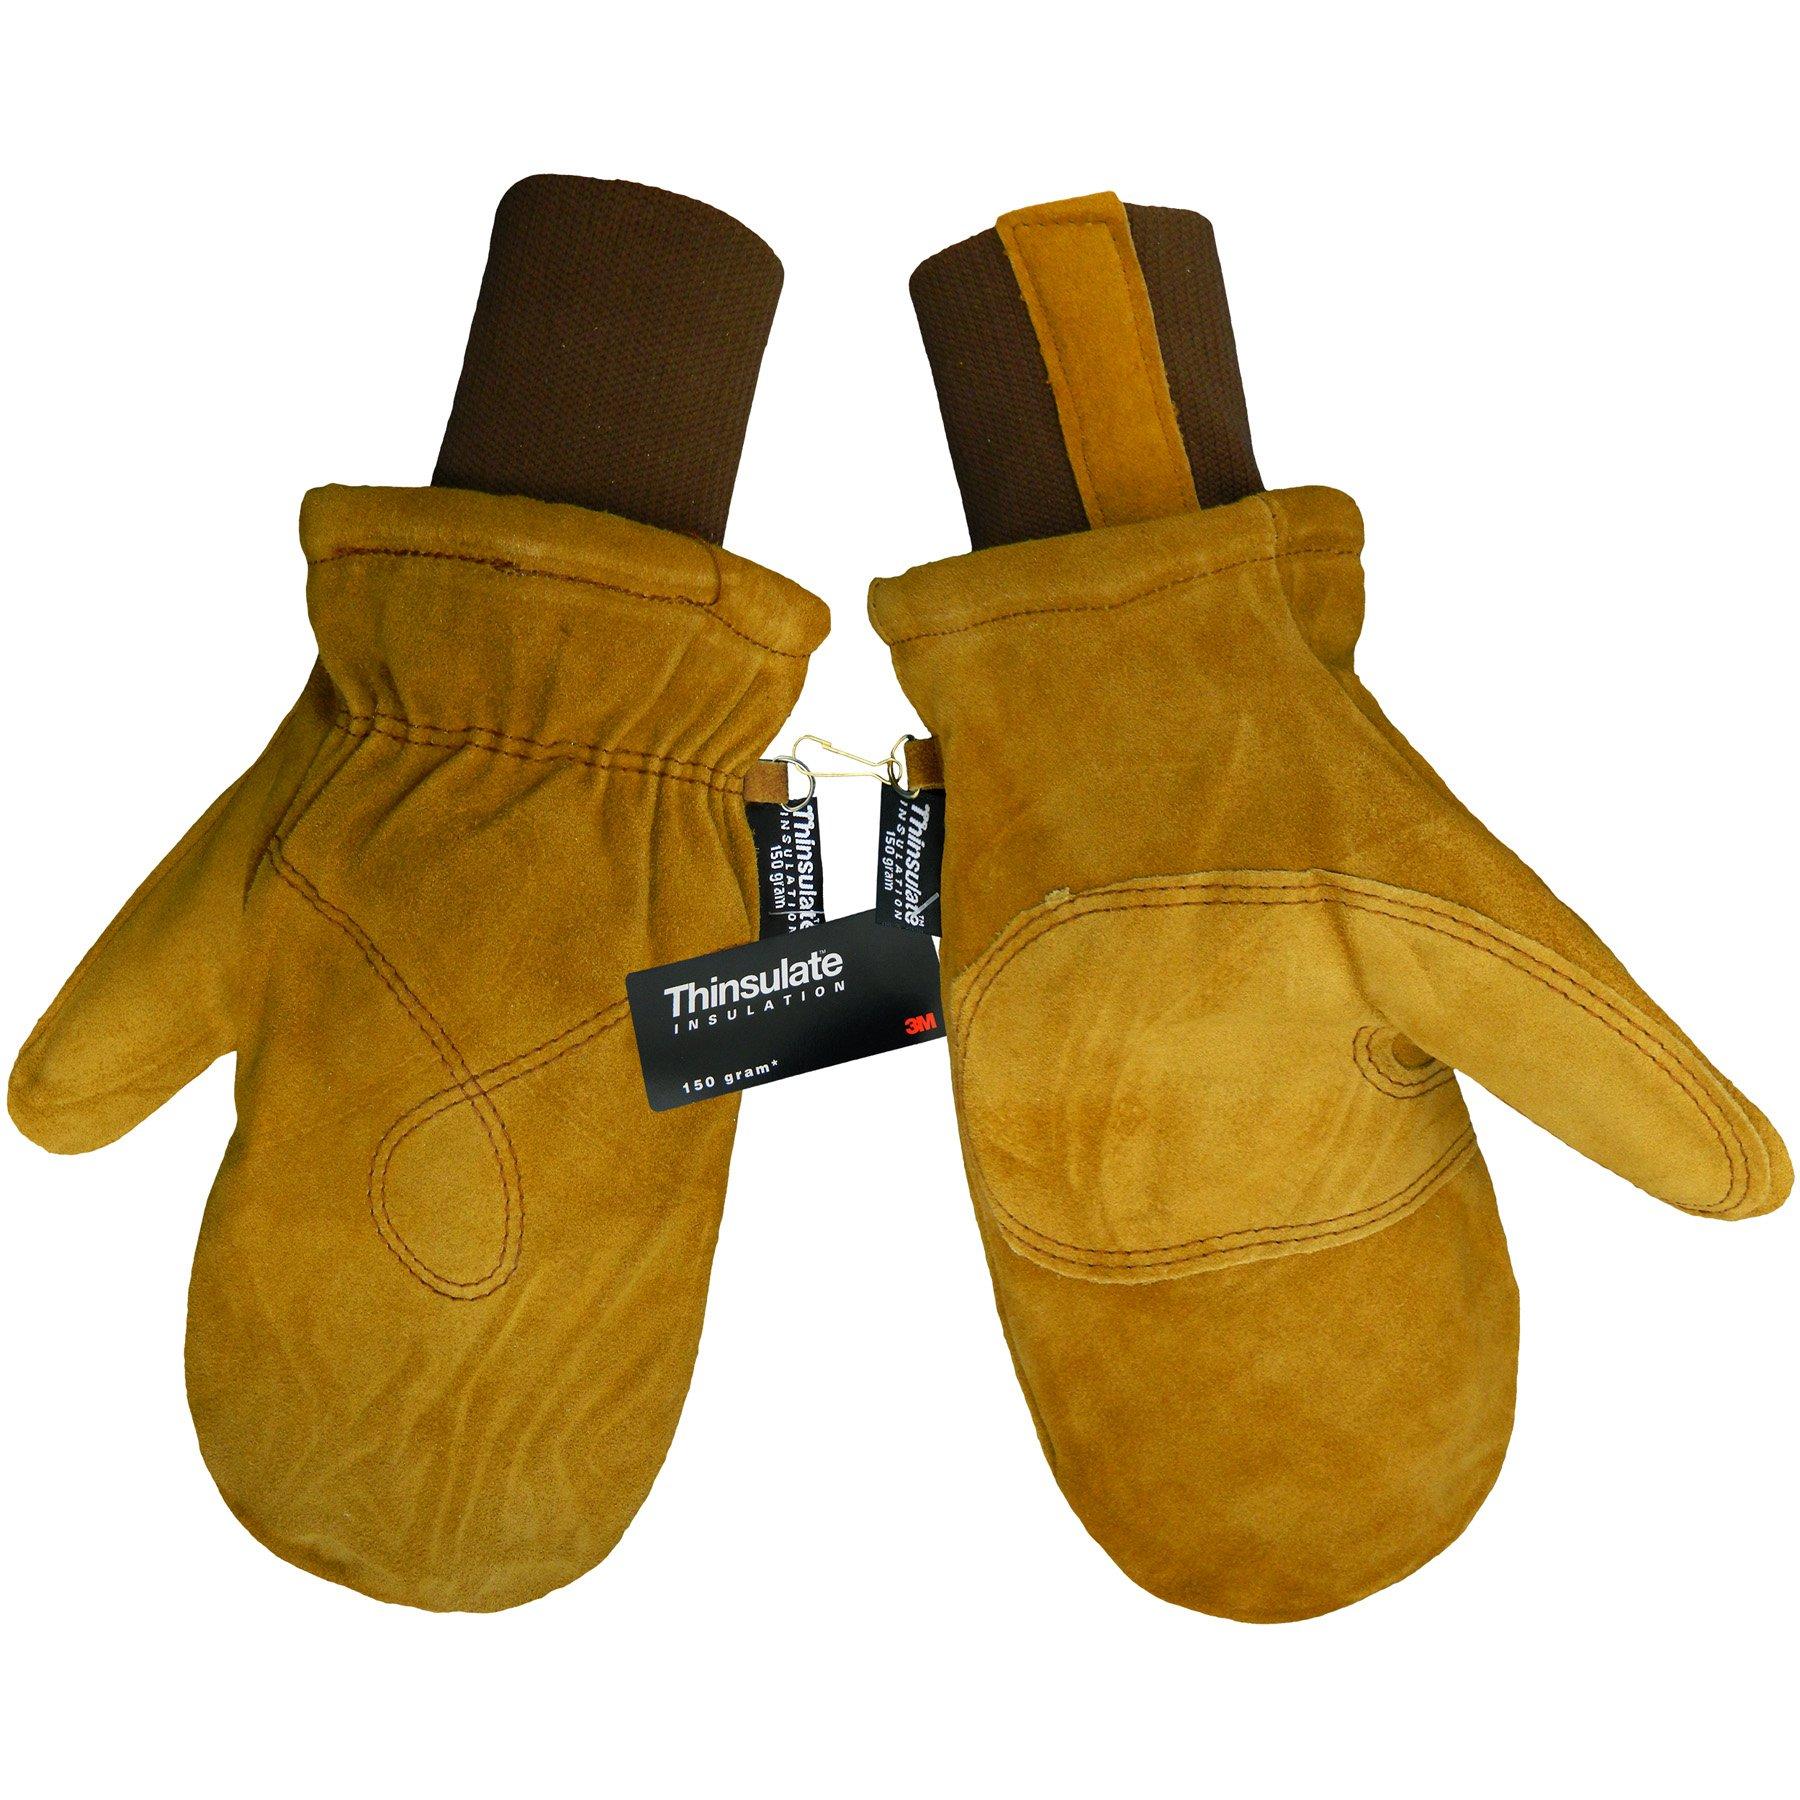 Global Glove 594MIT Russet Cow Split Premium Grade Freezer Mitten with Knit Wrist Cuff, Extra Large (Case of 144)